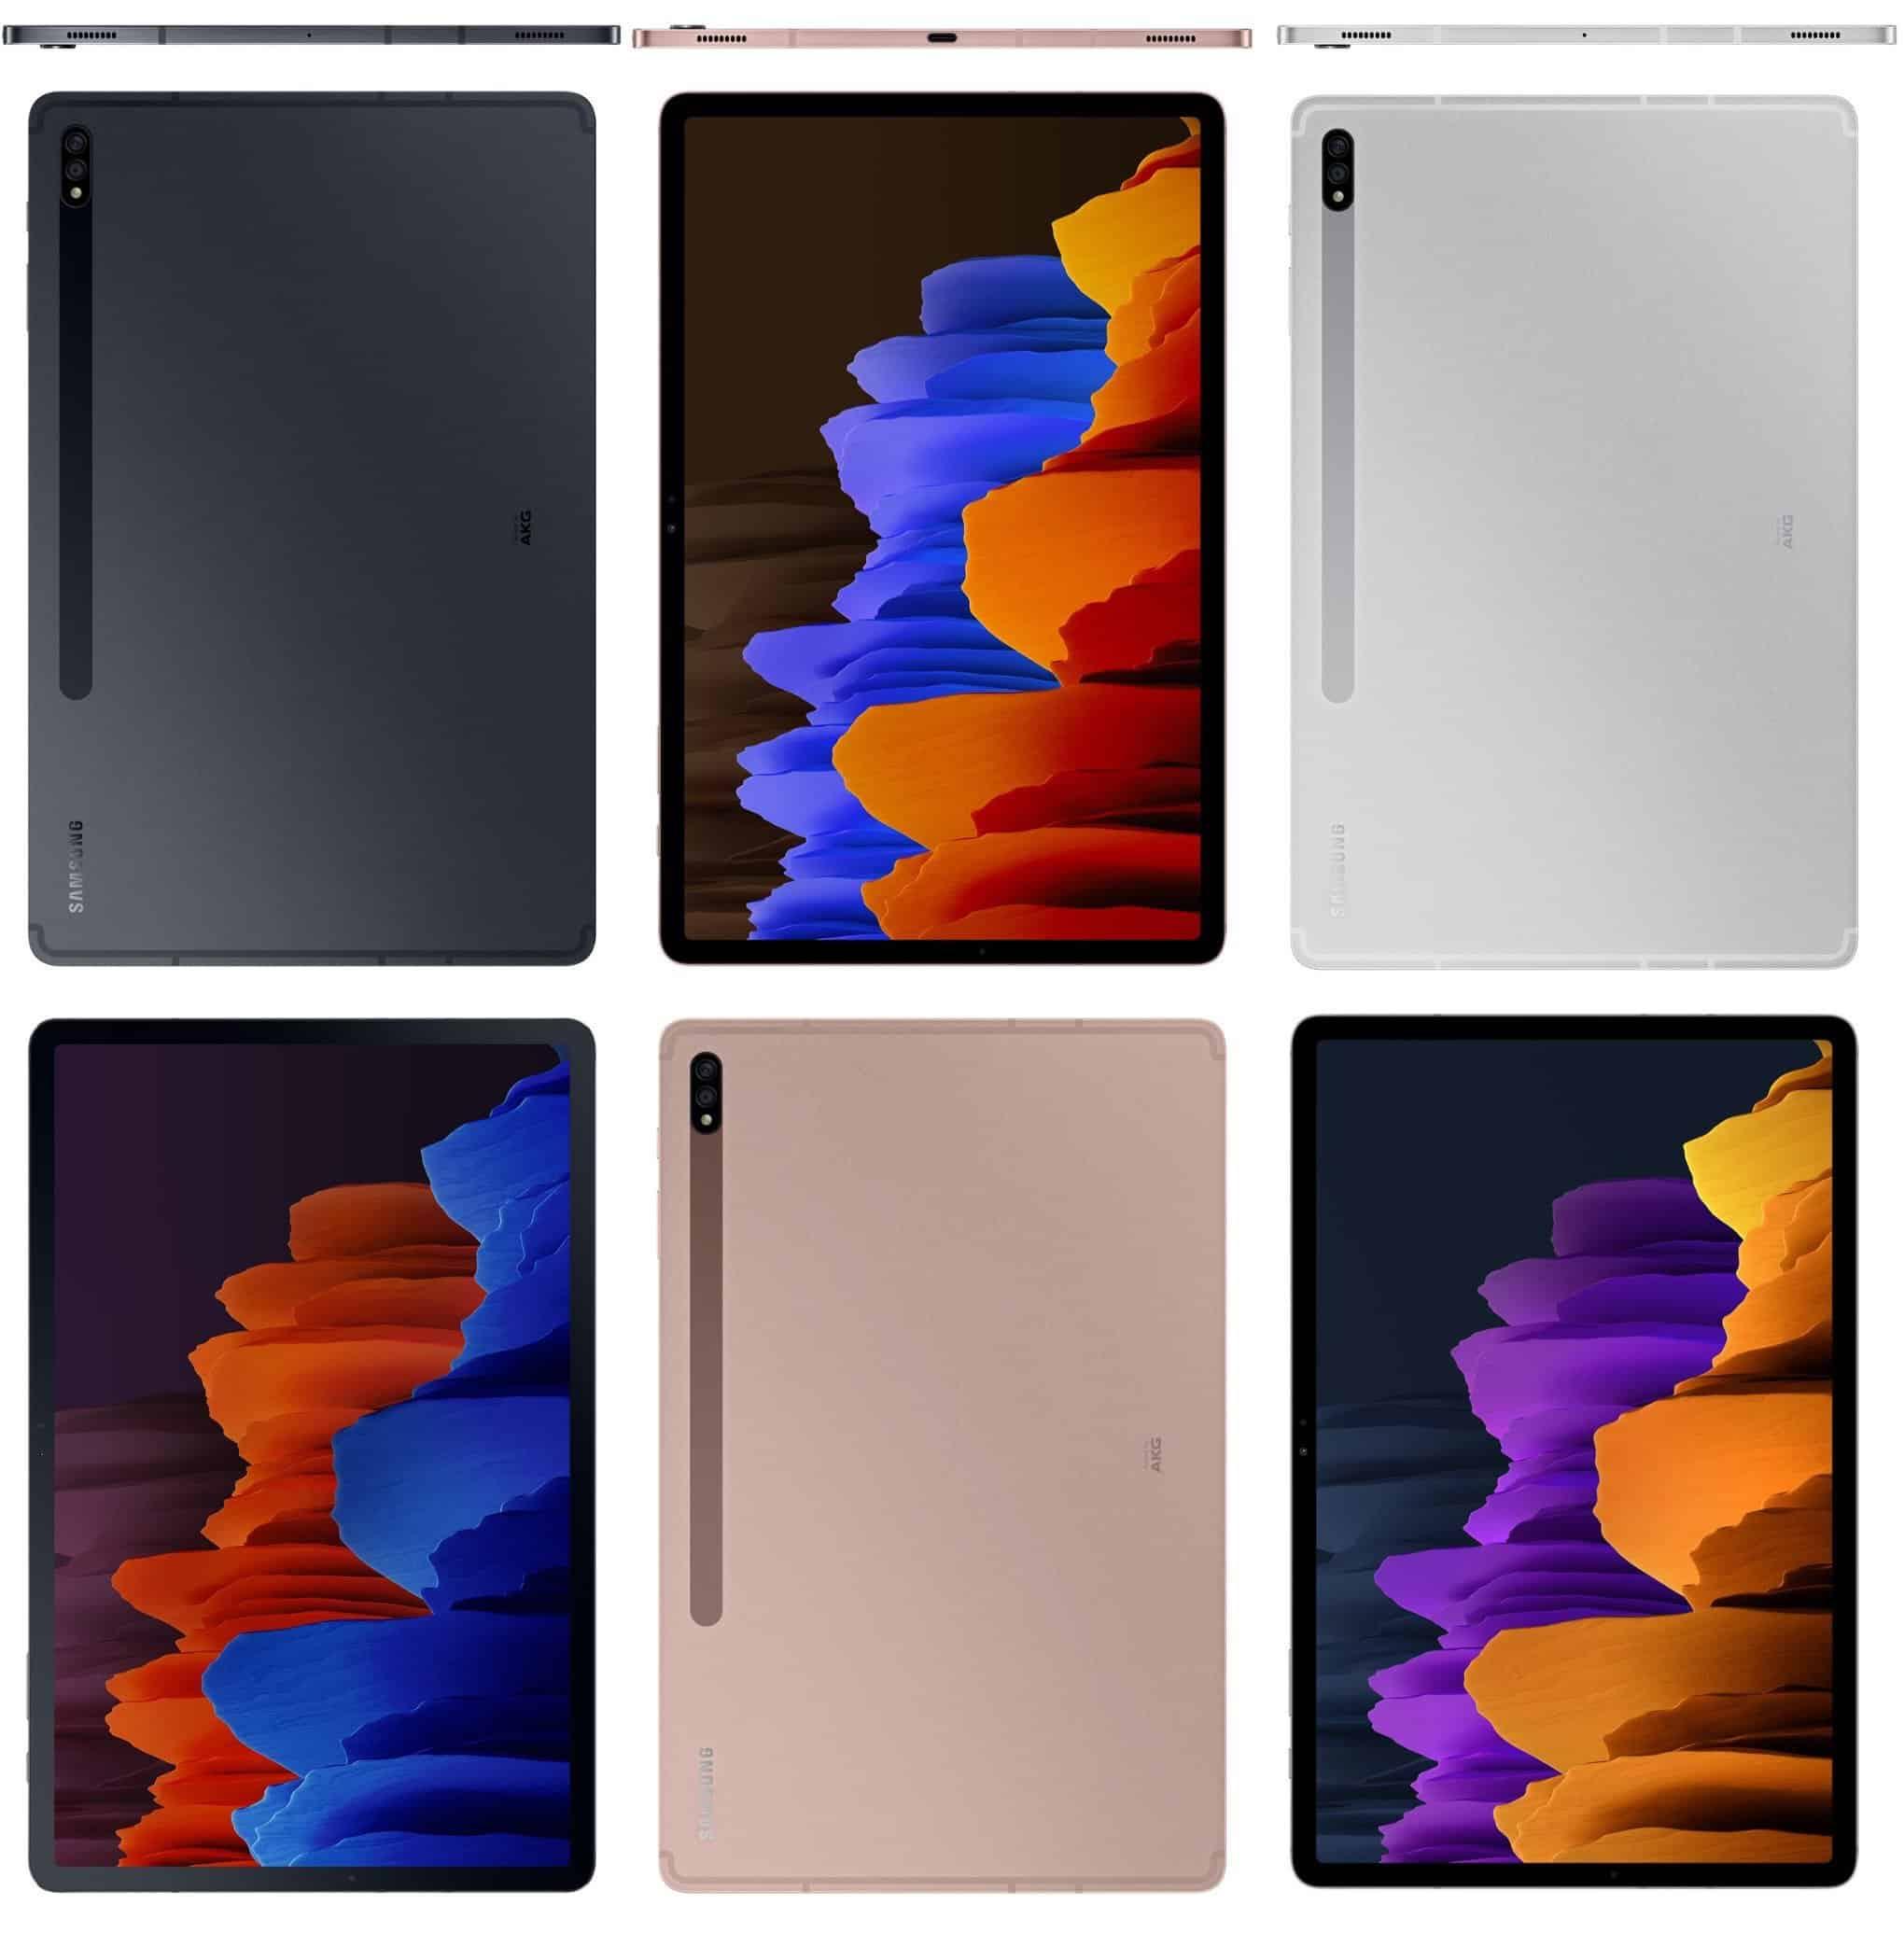 Samsung Galaxy Tab S7 Plus Color Options